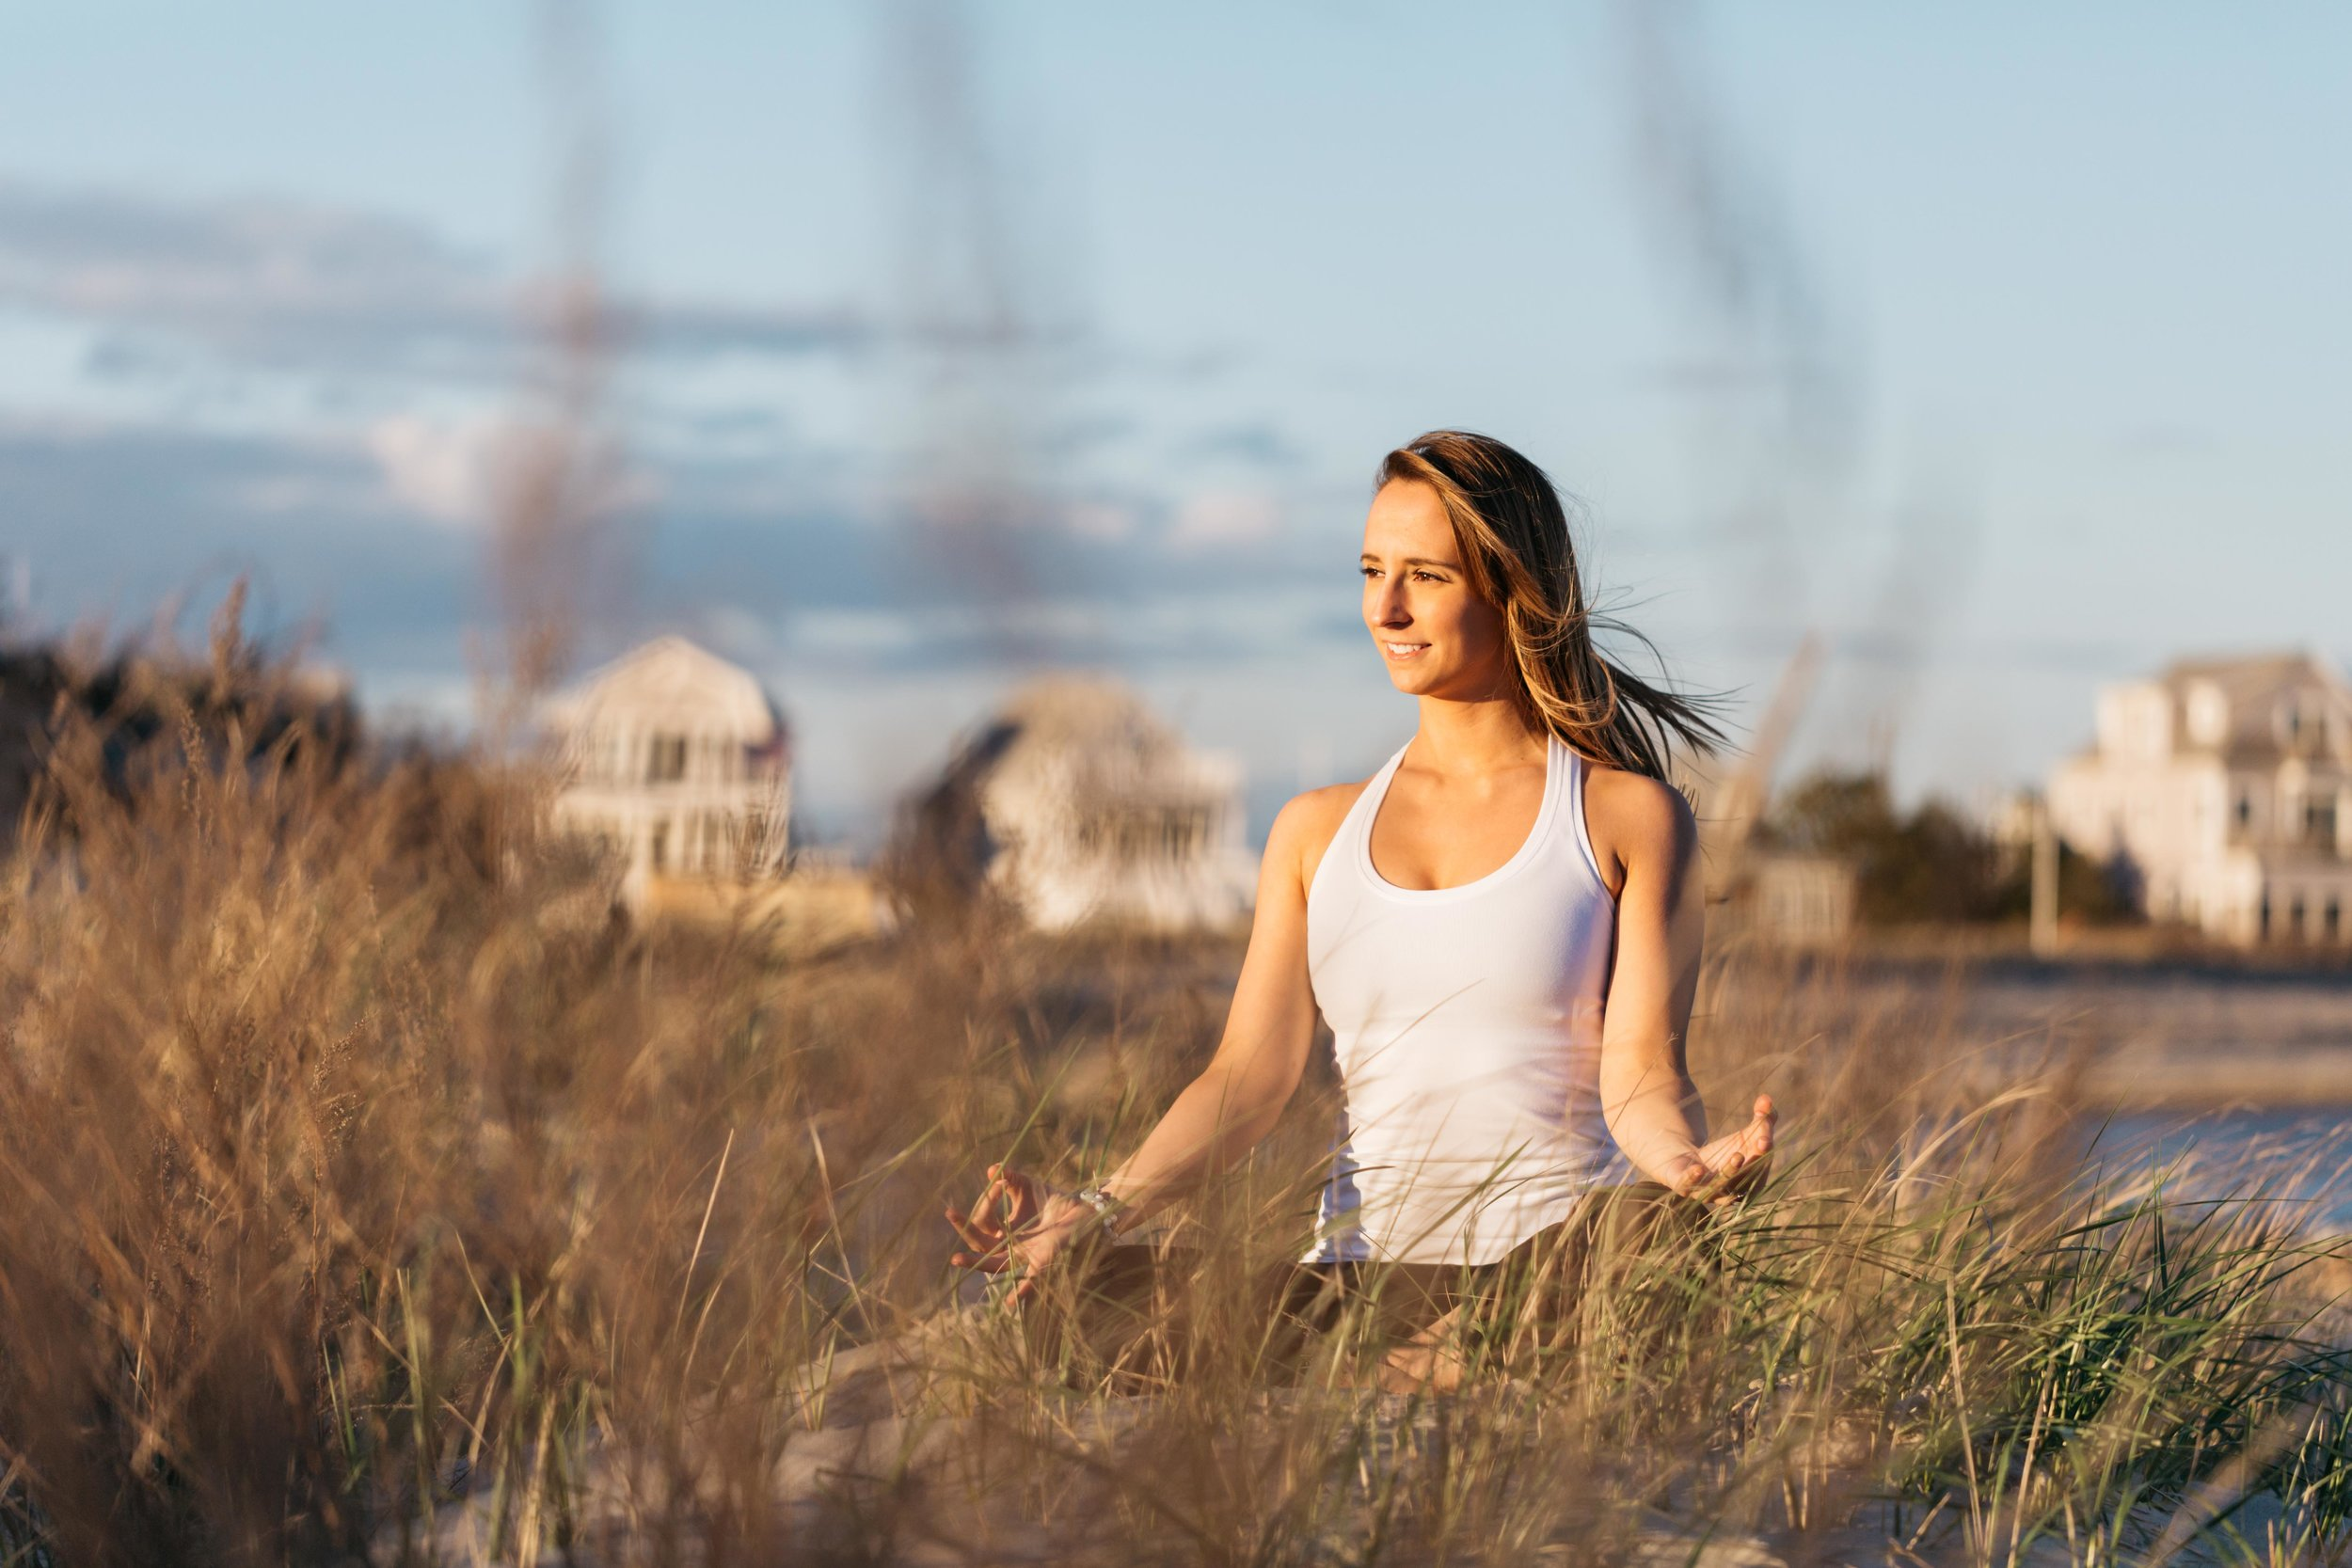 boston-yoga-photographer-kerry-10.jpg